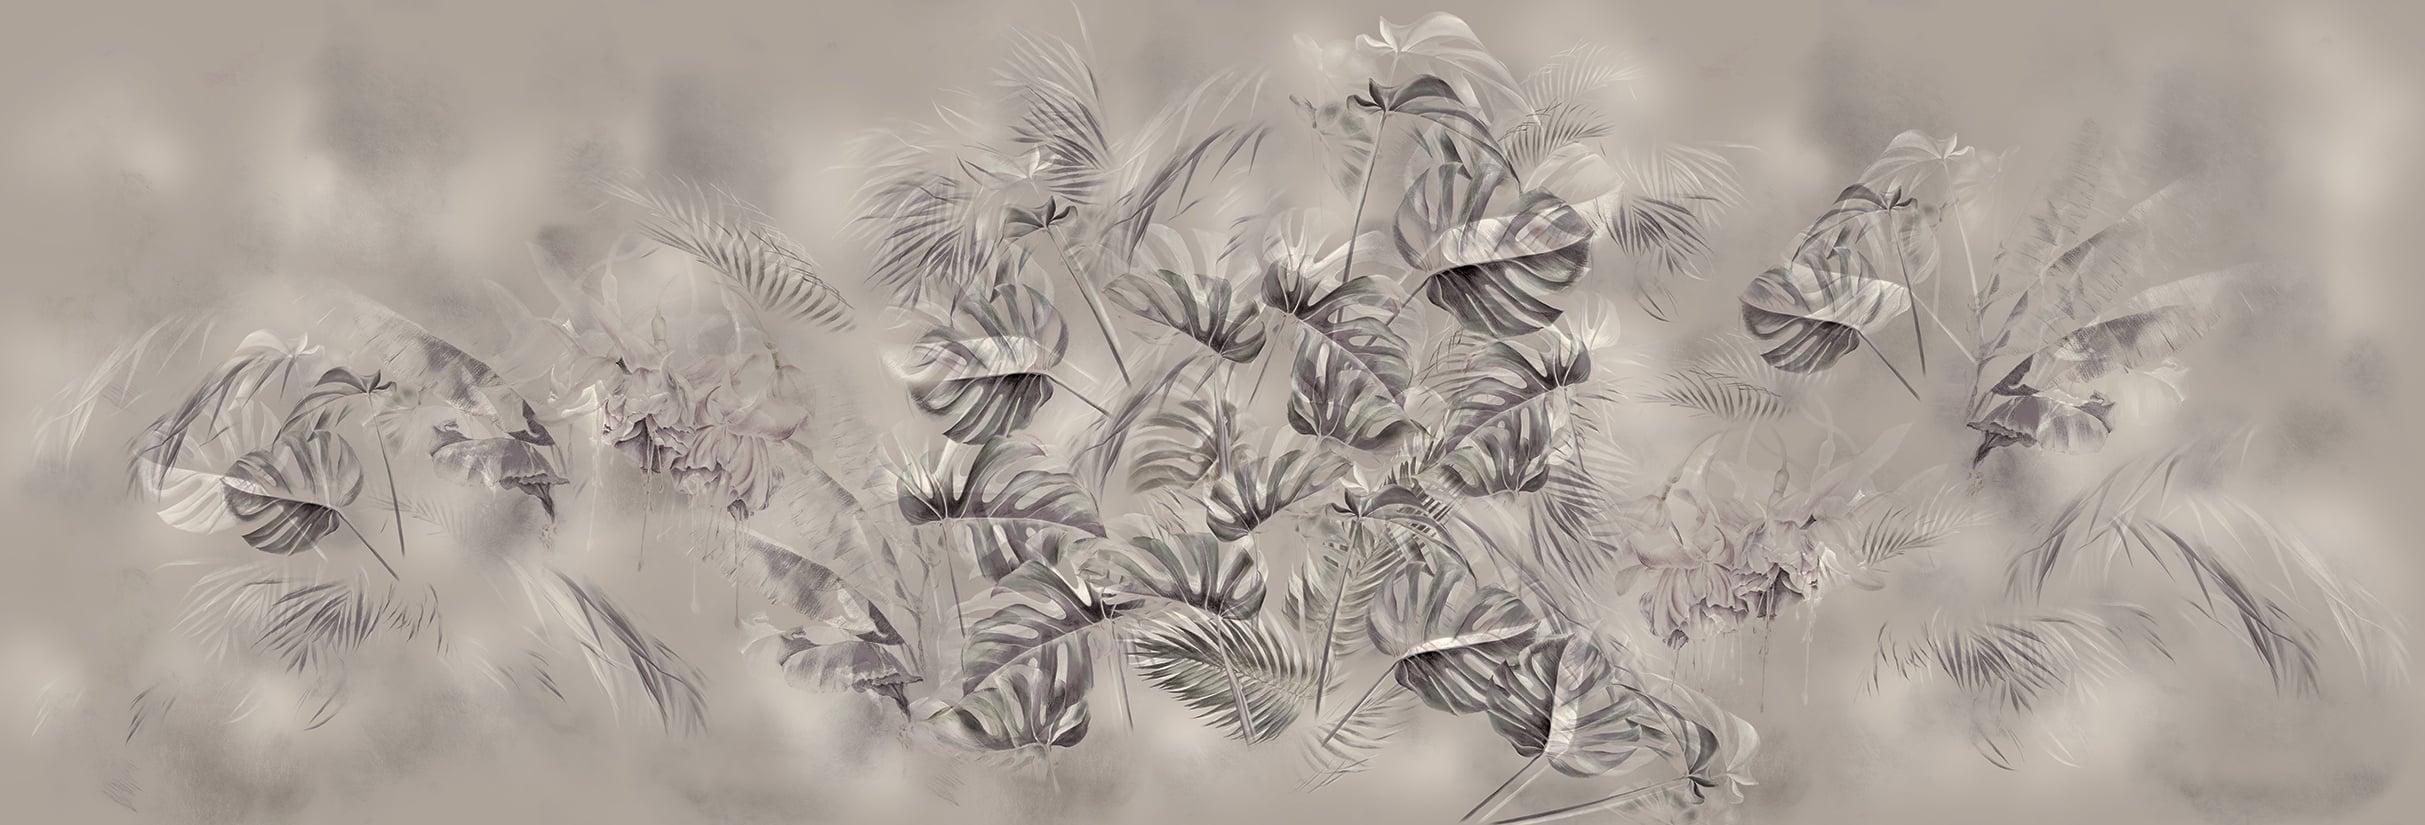 Carta Da Parati Immagini forest breath